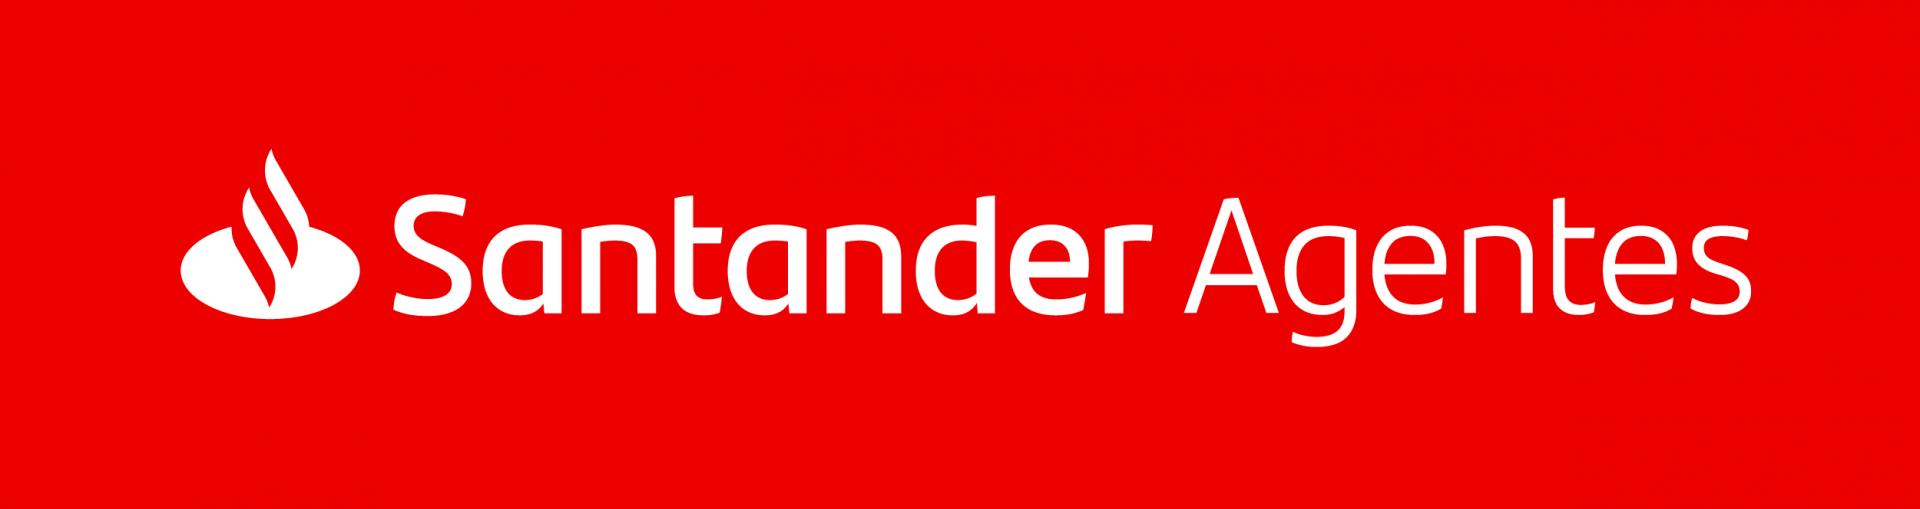 FA_SANTANDER_AGENTES_EV_NEG_RGB.png